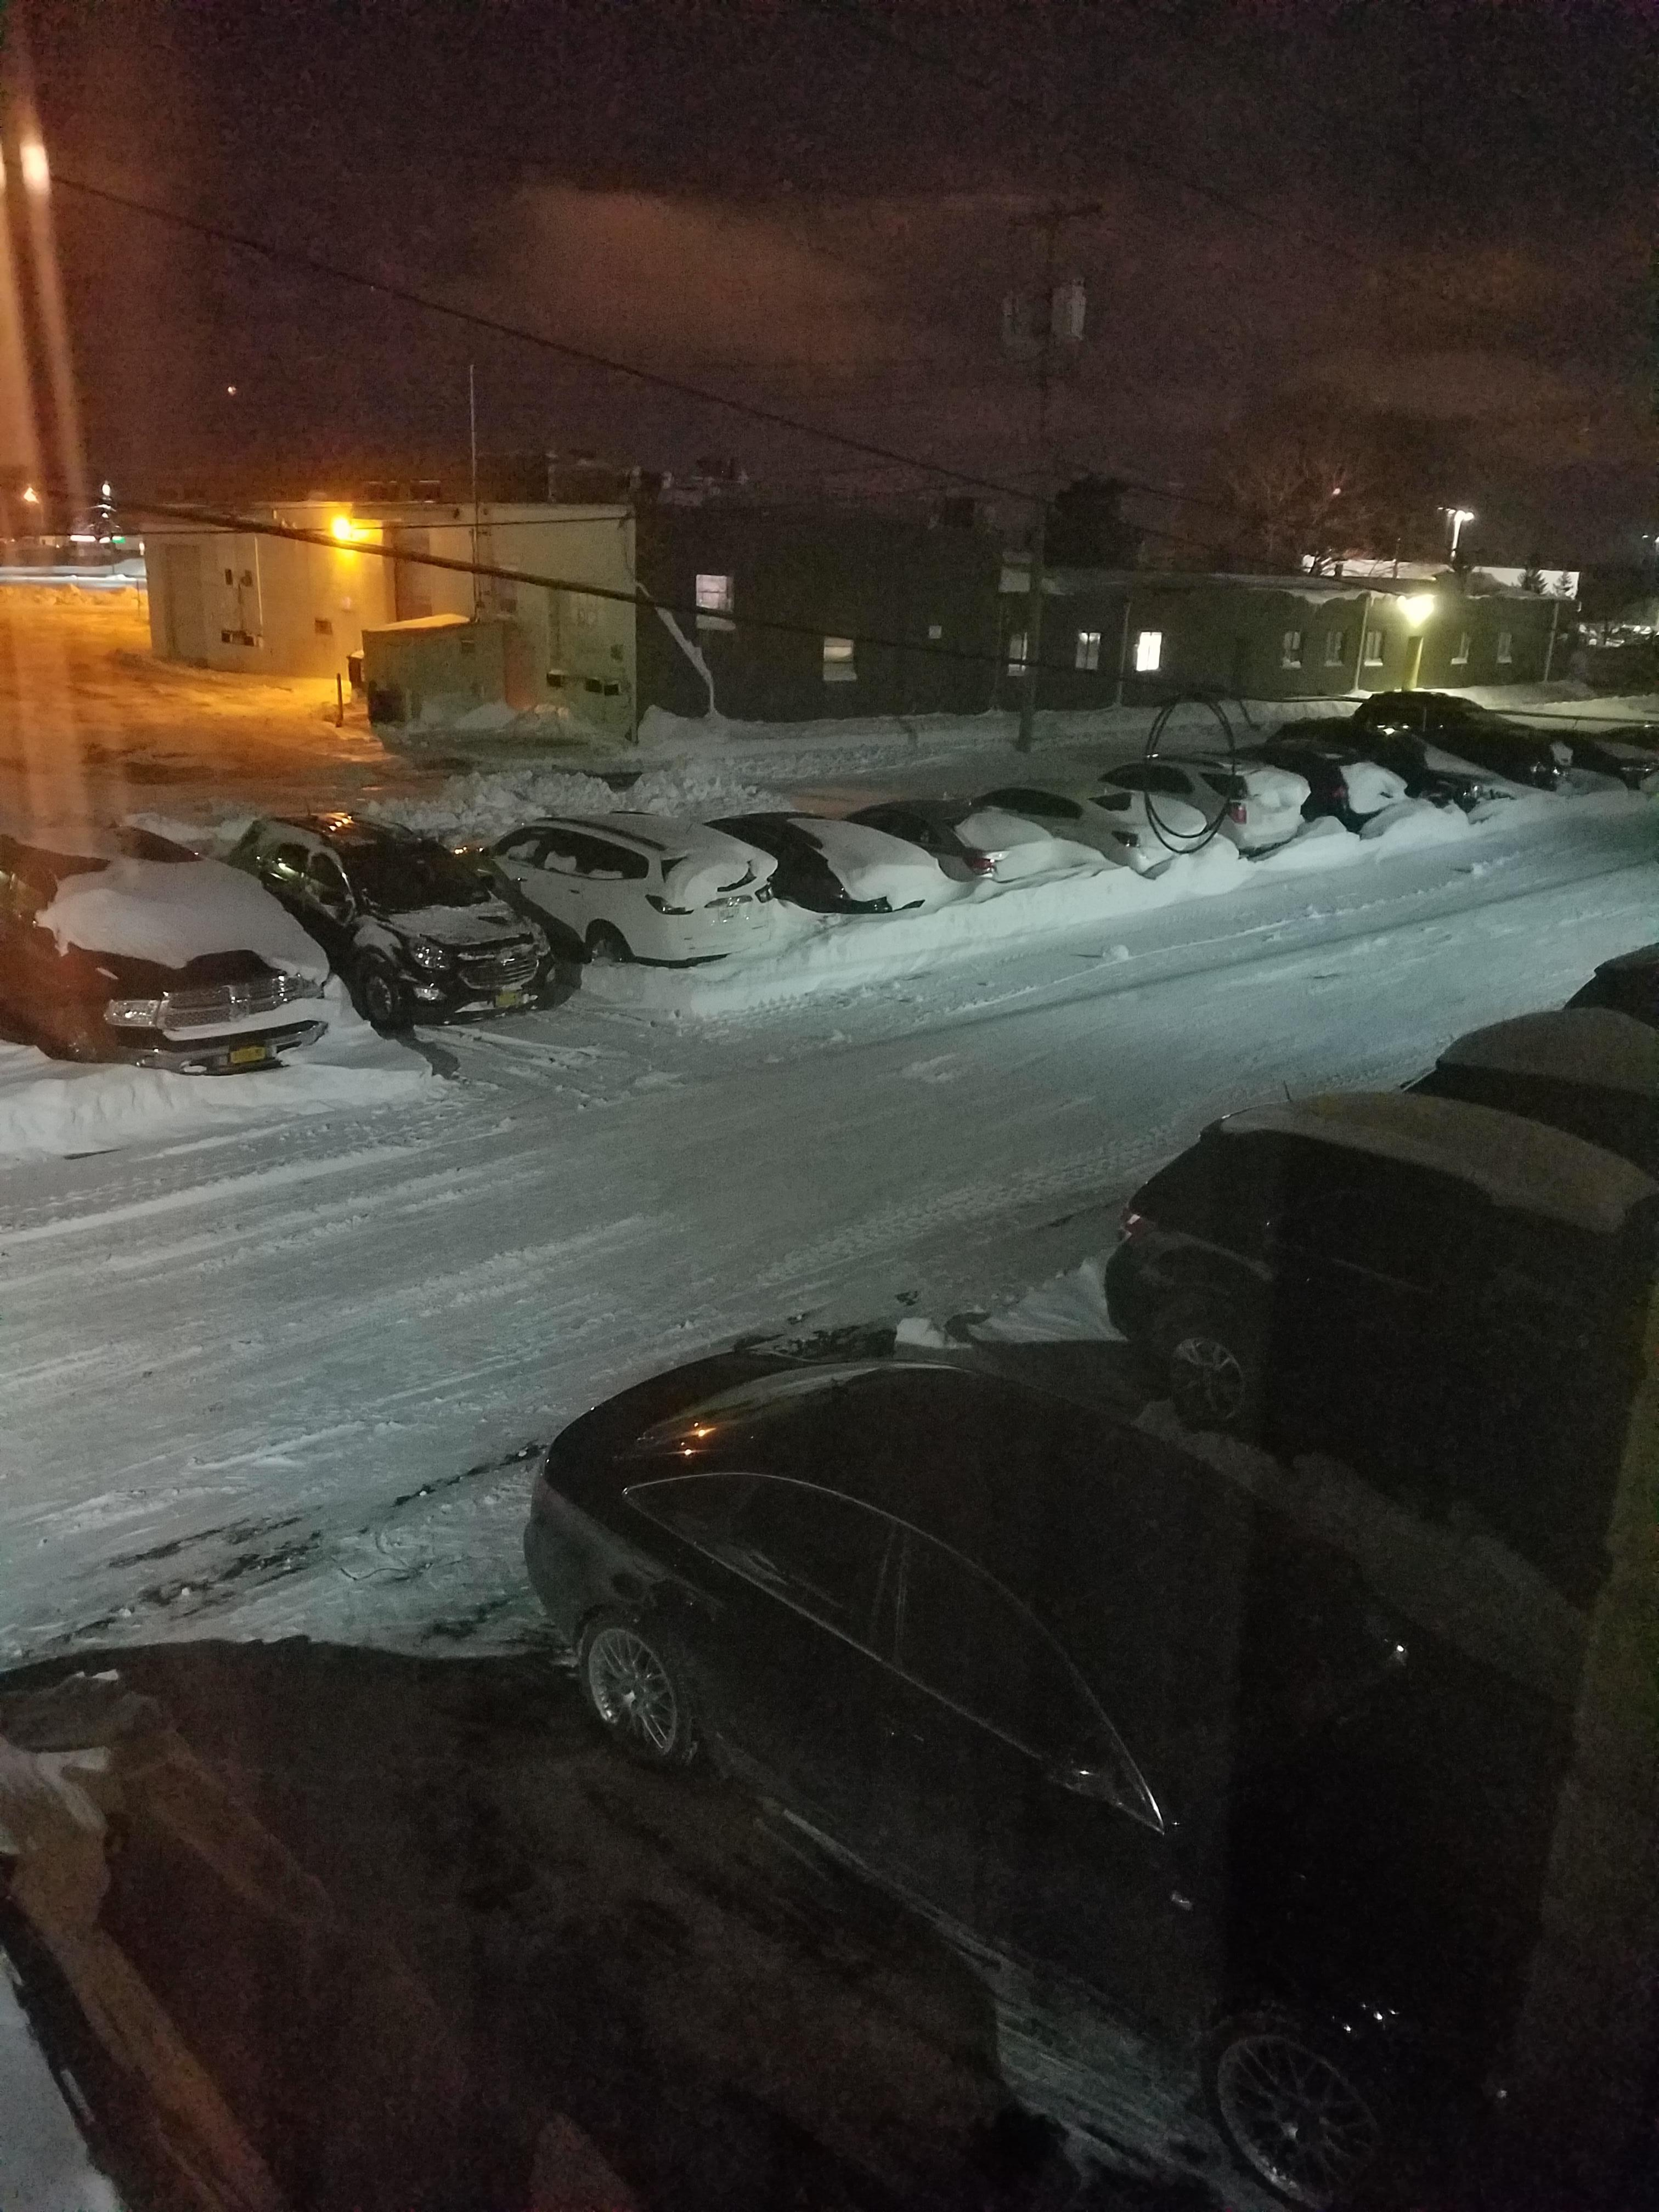 Parking lot view